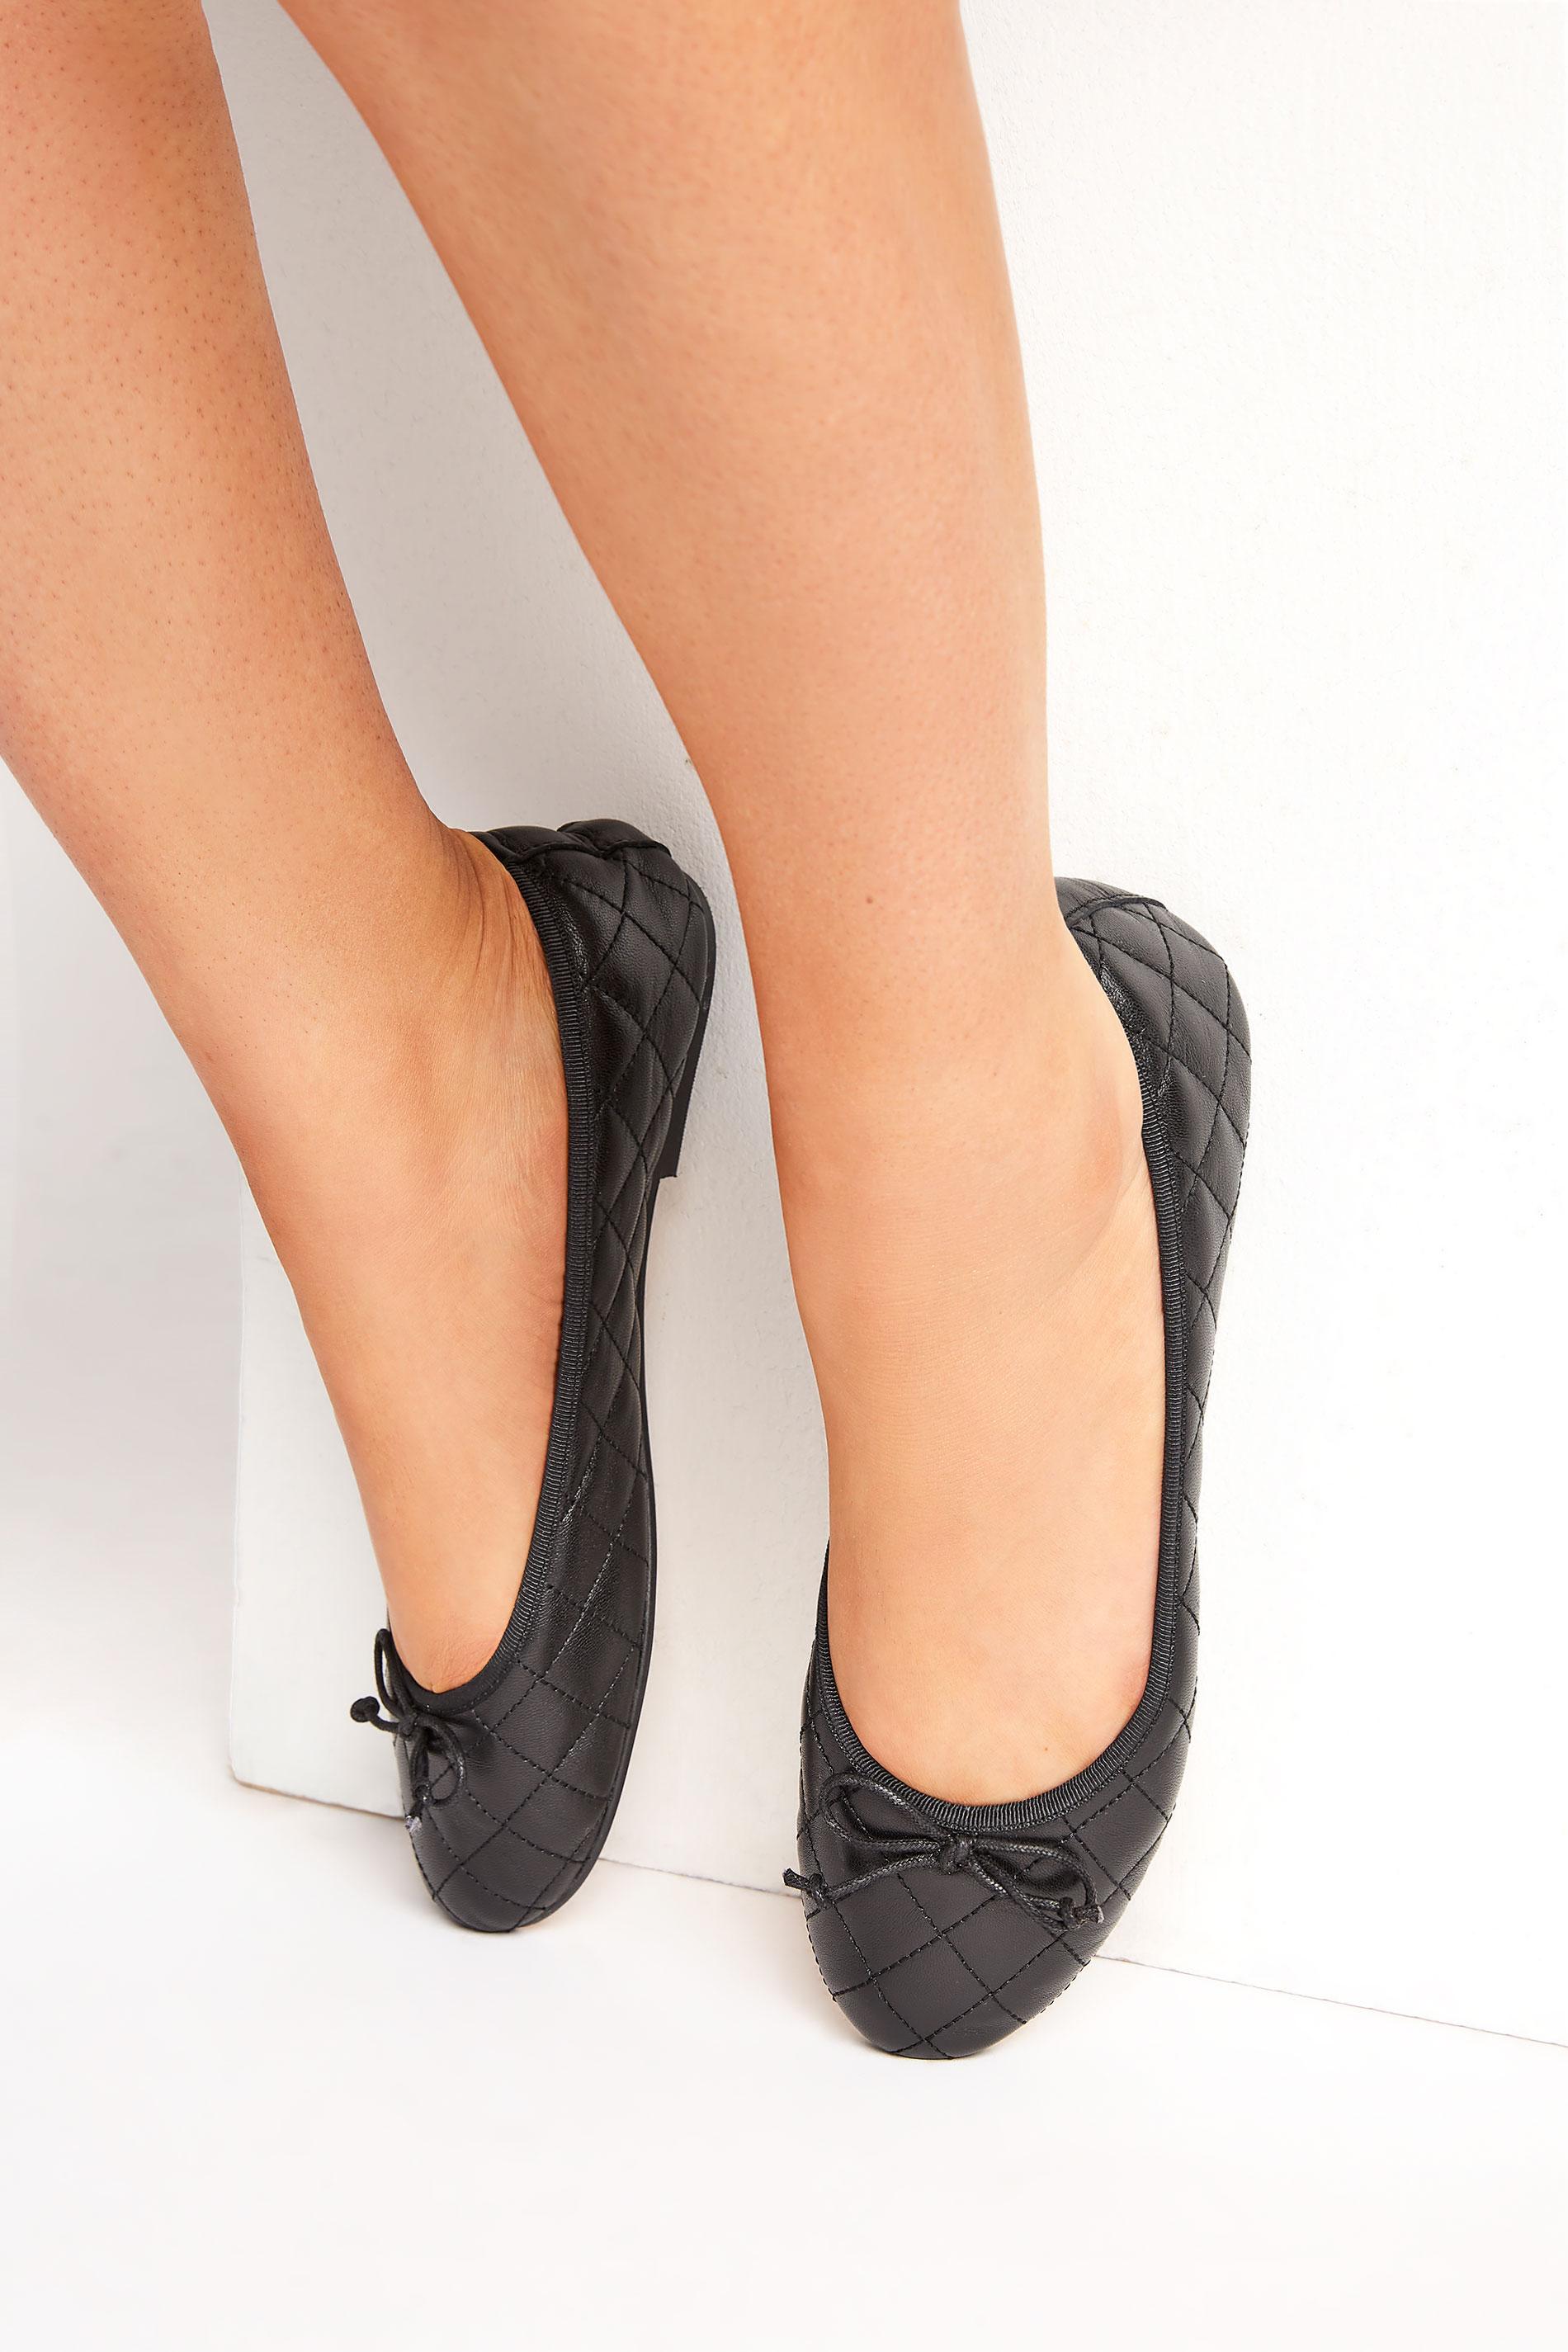 LTS Black Leather Quilted Ballet Pumps_M.jpg